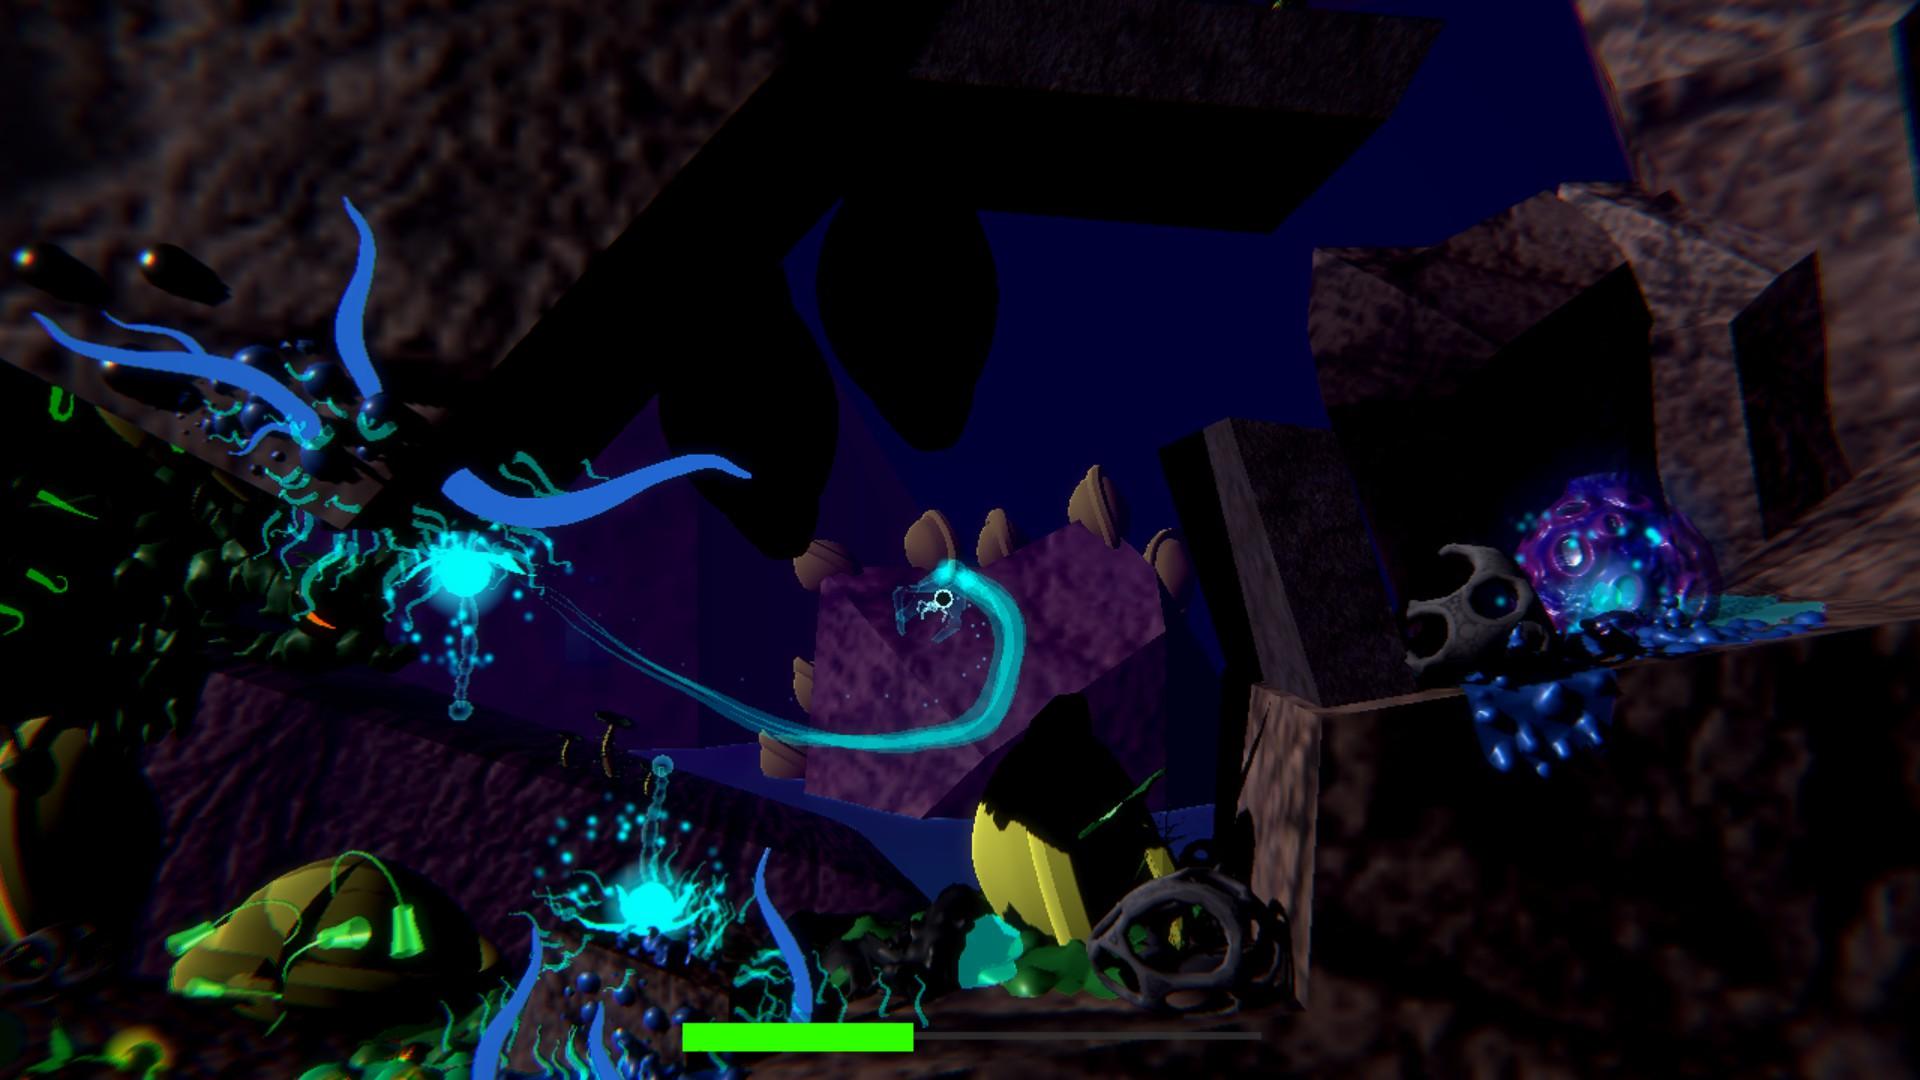 Ectolibrium: A 2.5D platformer about strange alien life